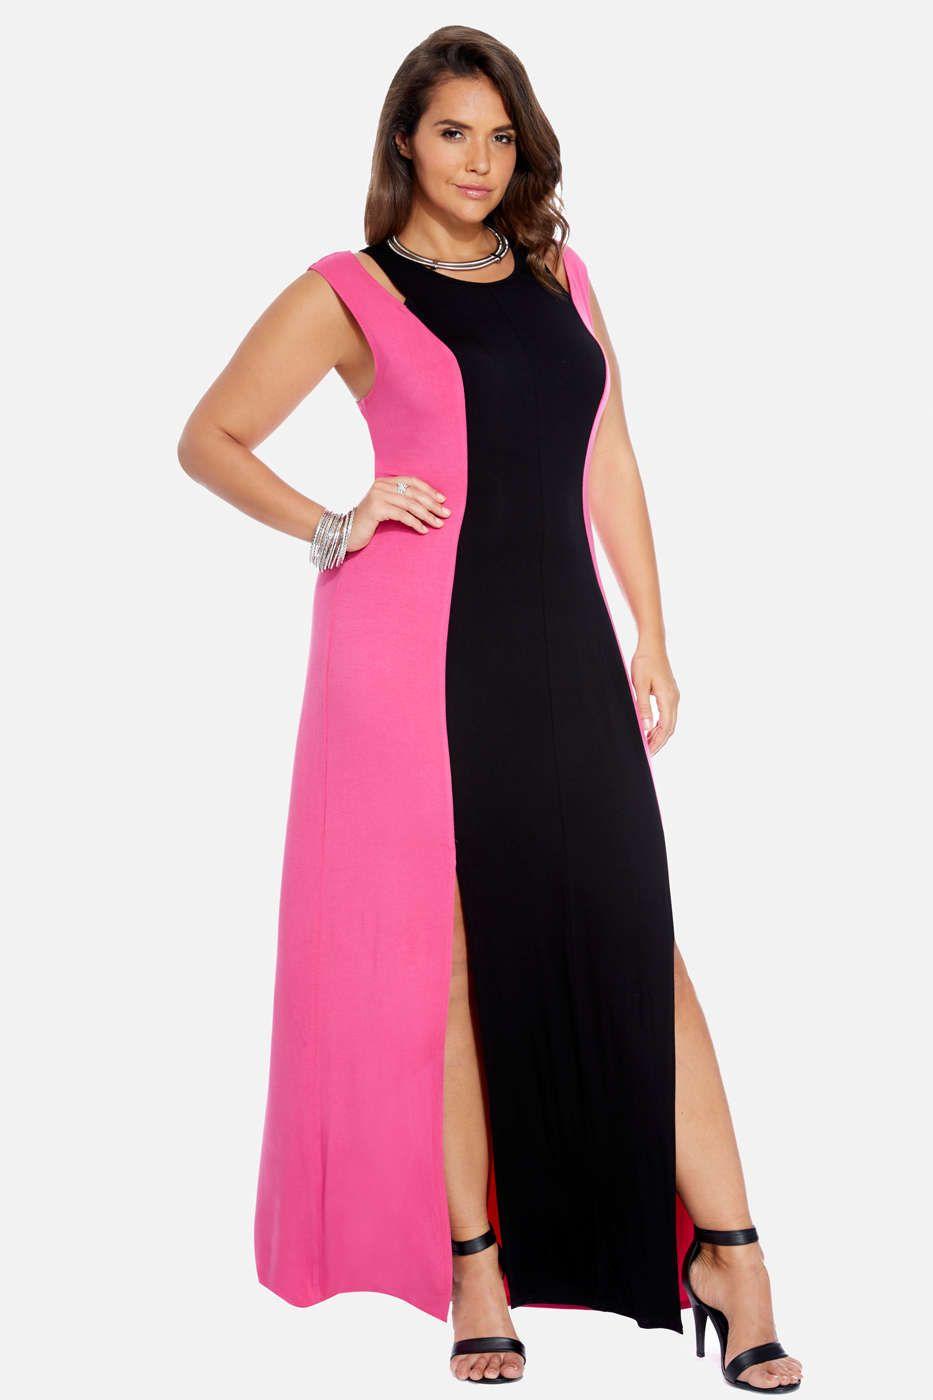 Plus Size Trista Color-Block Maxi Dress | Fashiontofigure.com ...